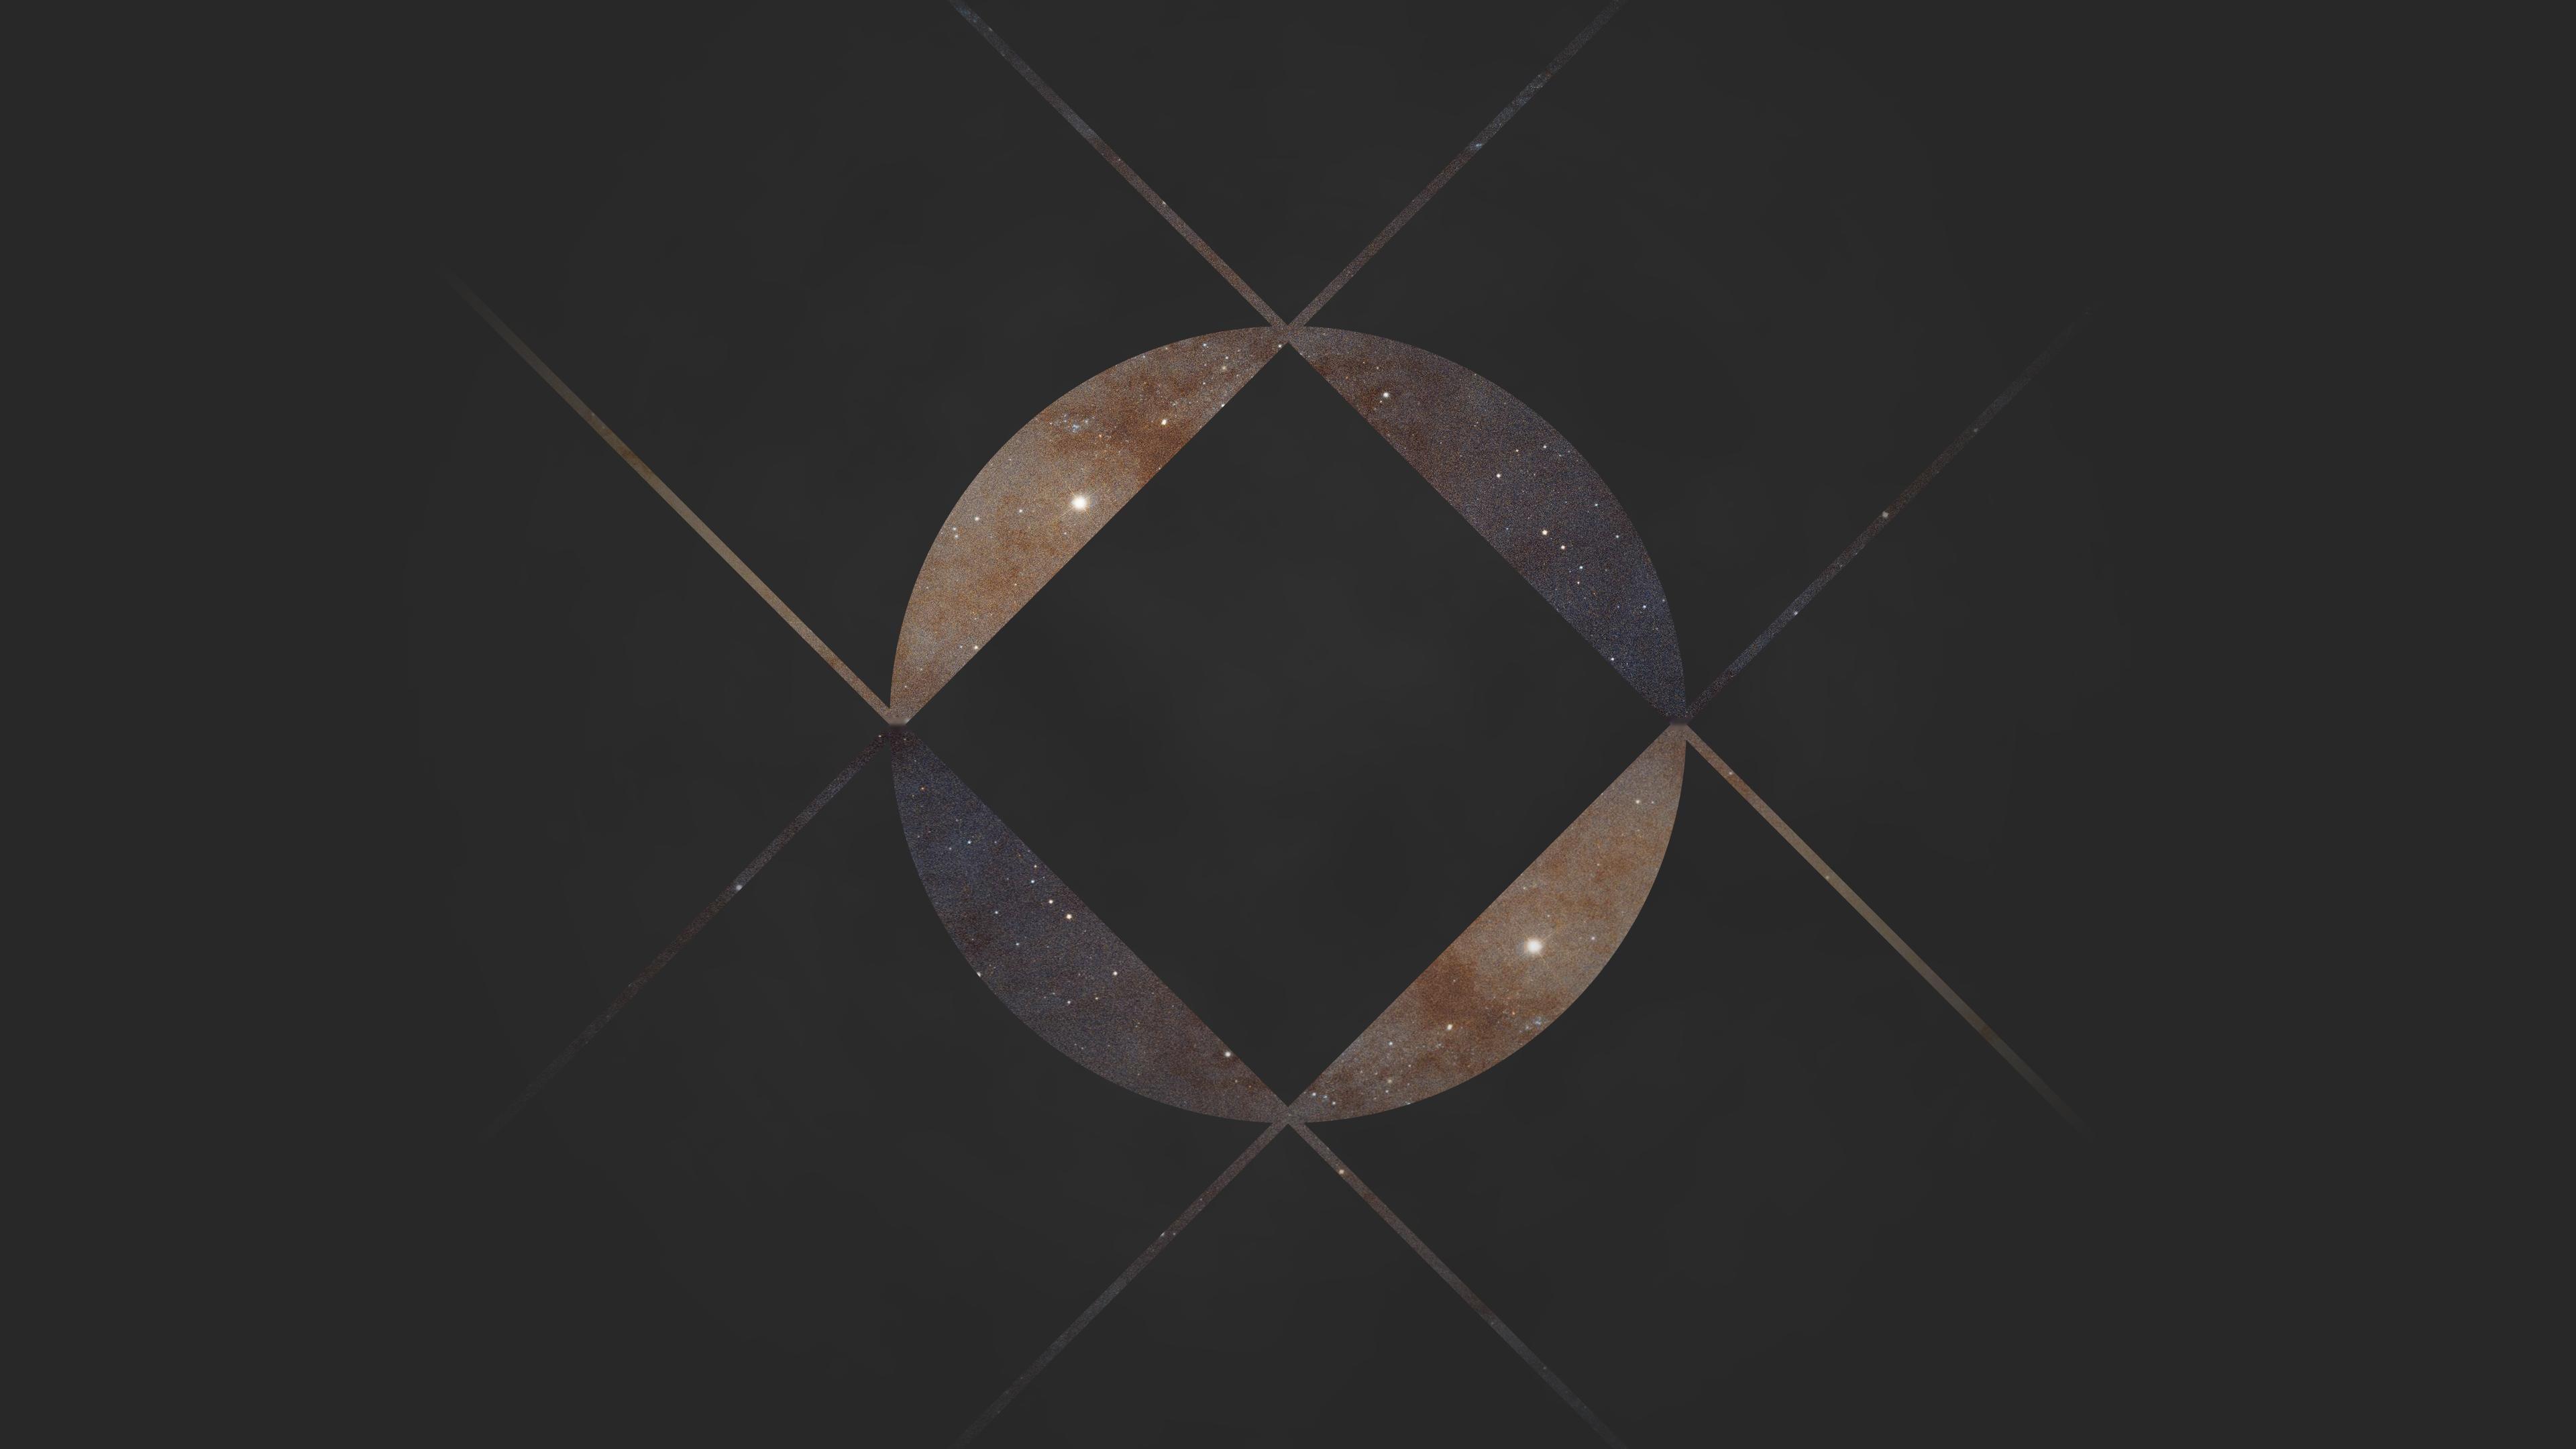 Square Galaxy [3840x2160]